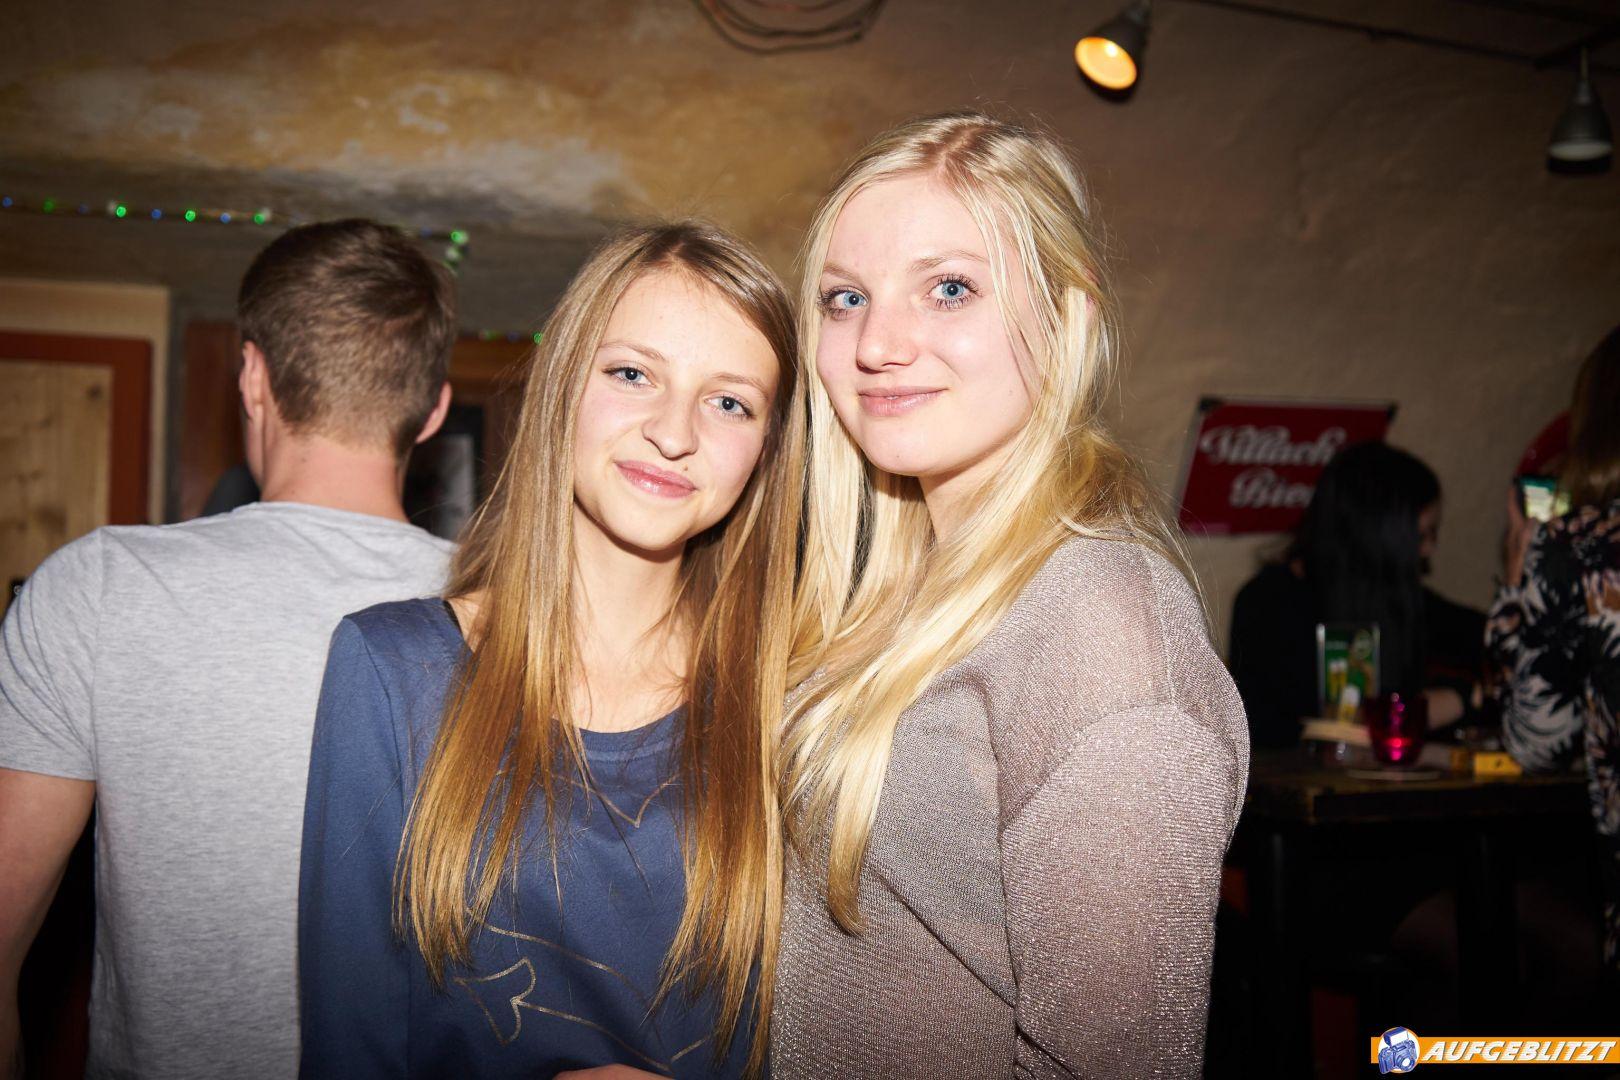 Eventfotos-Events-Mausefalle Lienz-Nudorf-Debant